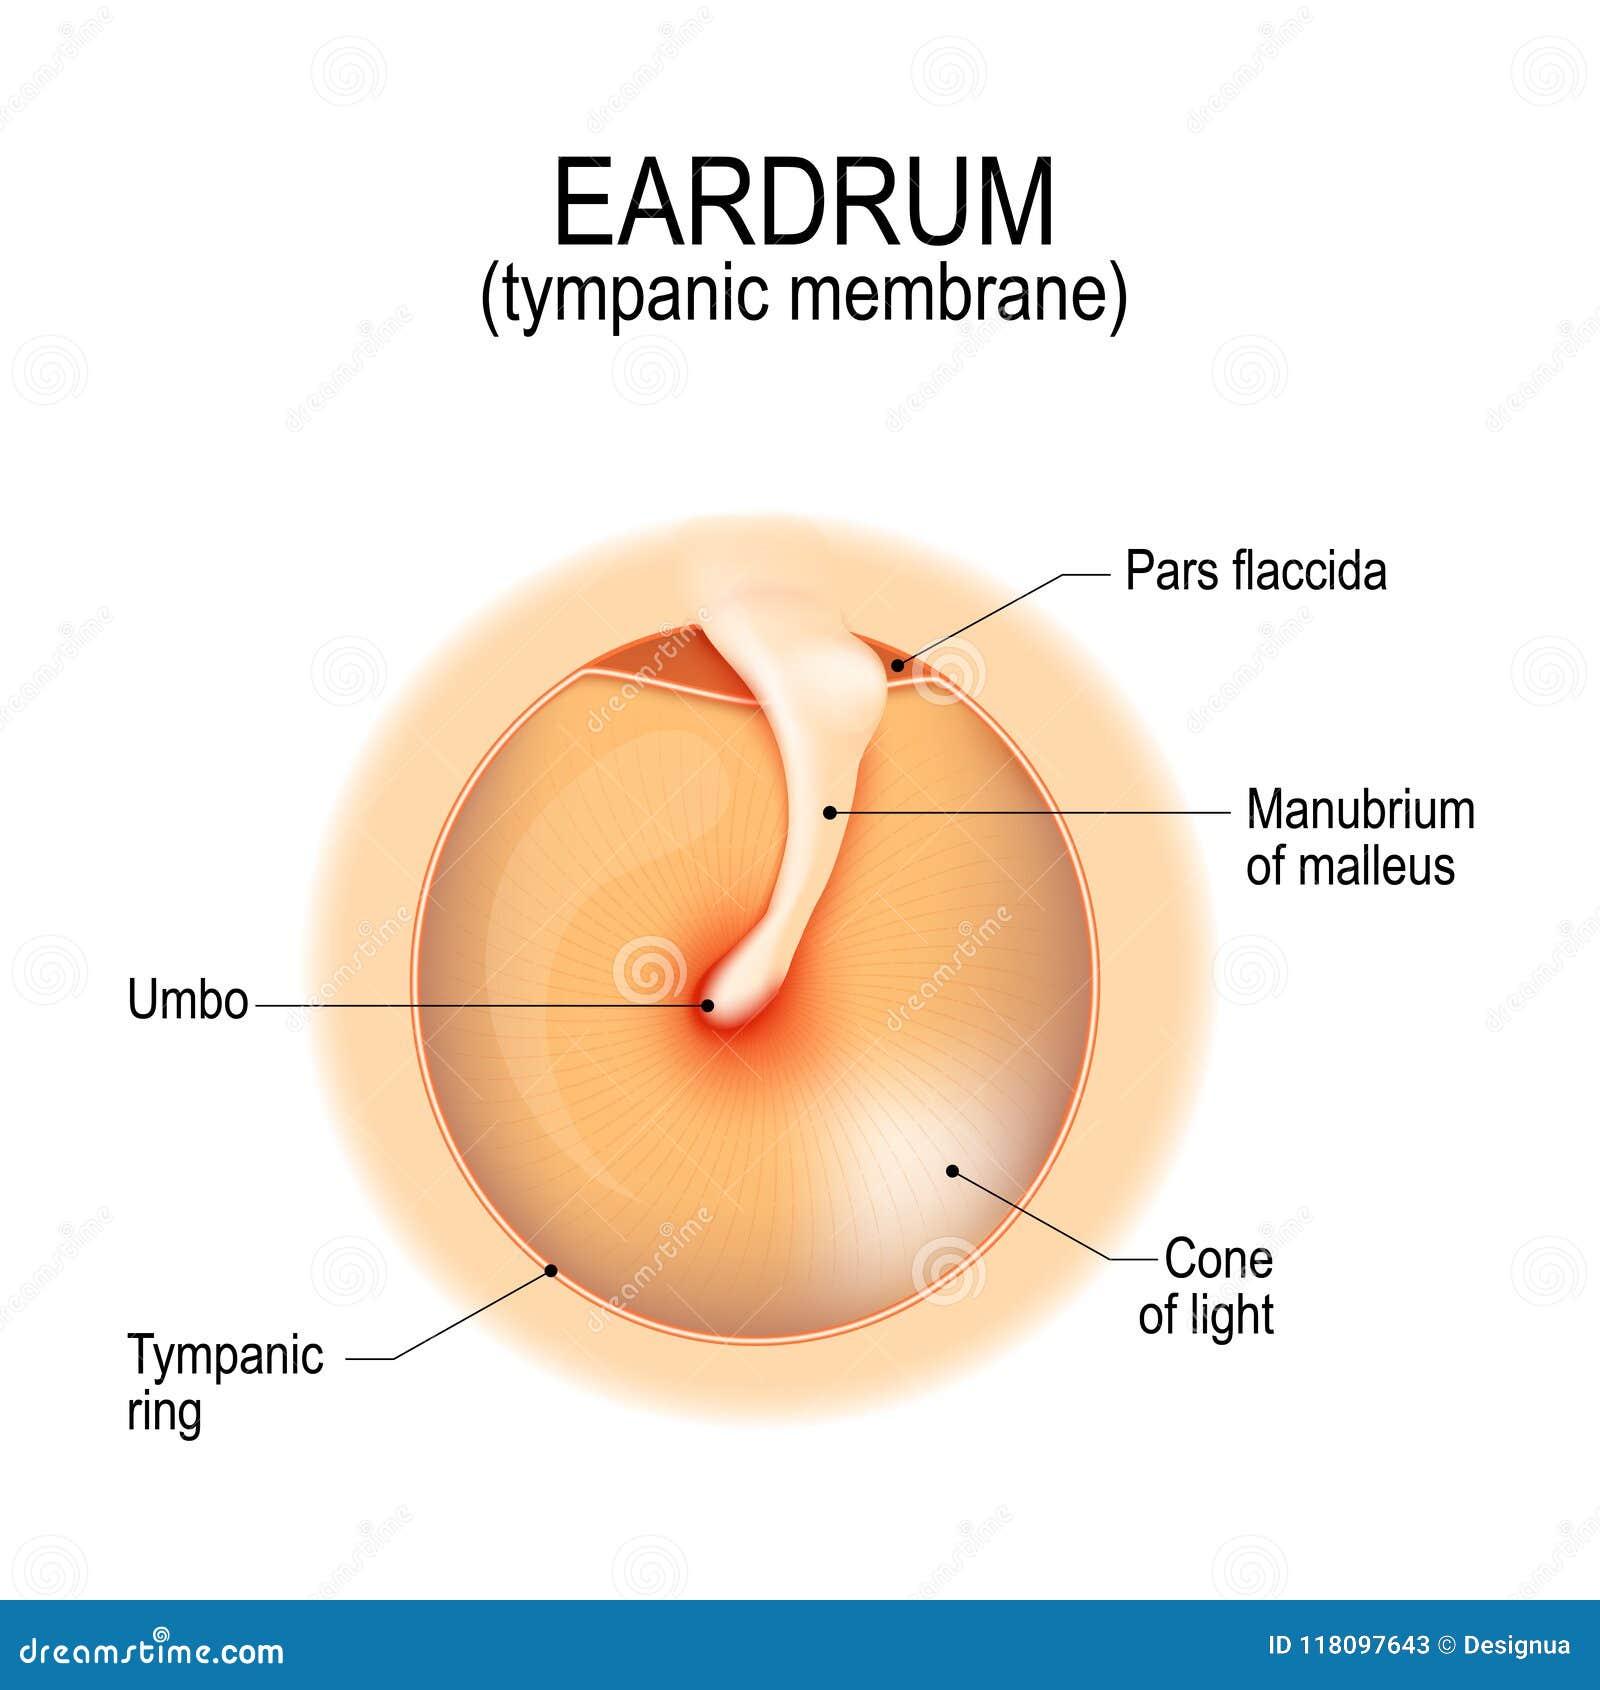 Anatomy Of The Eardrum Stock Vector Illustration Of Biology 118097643